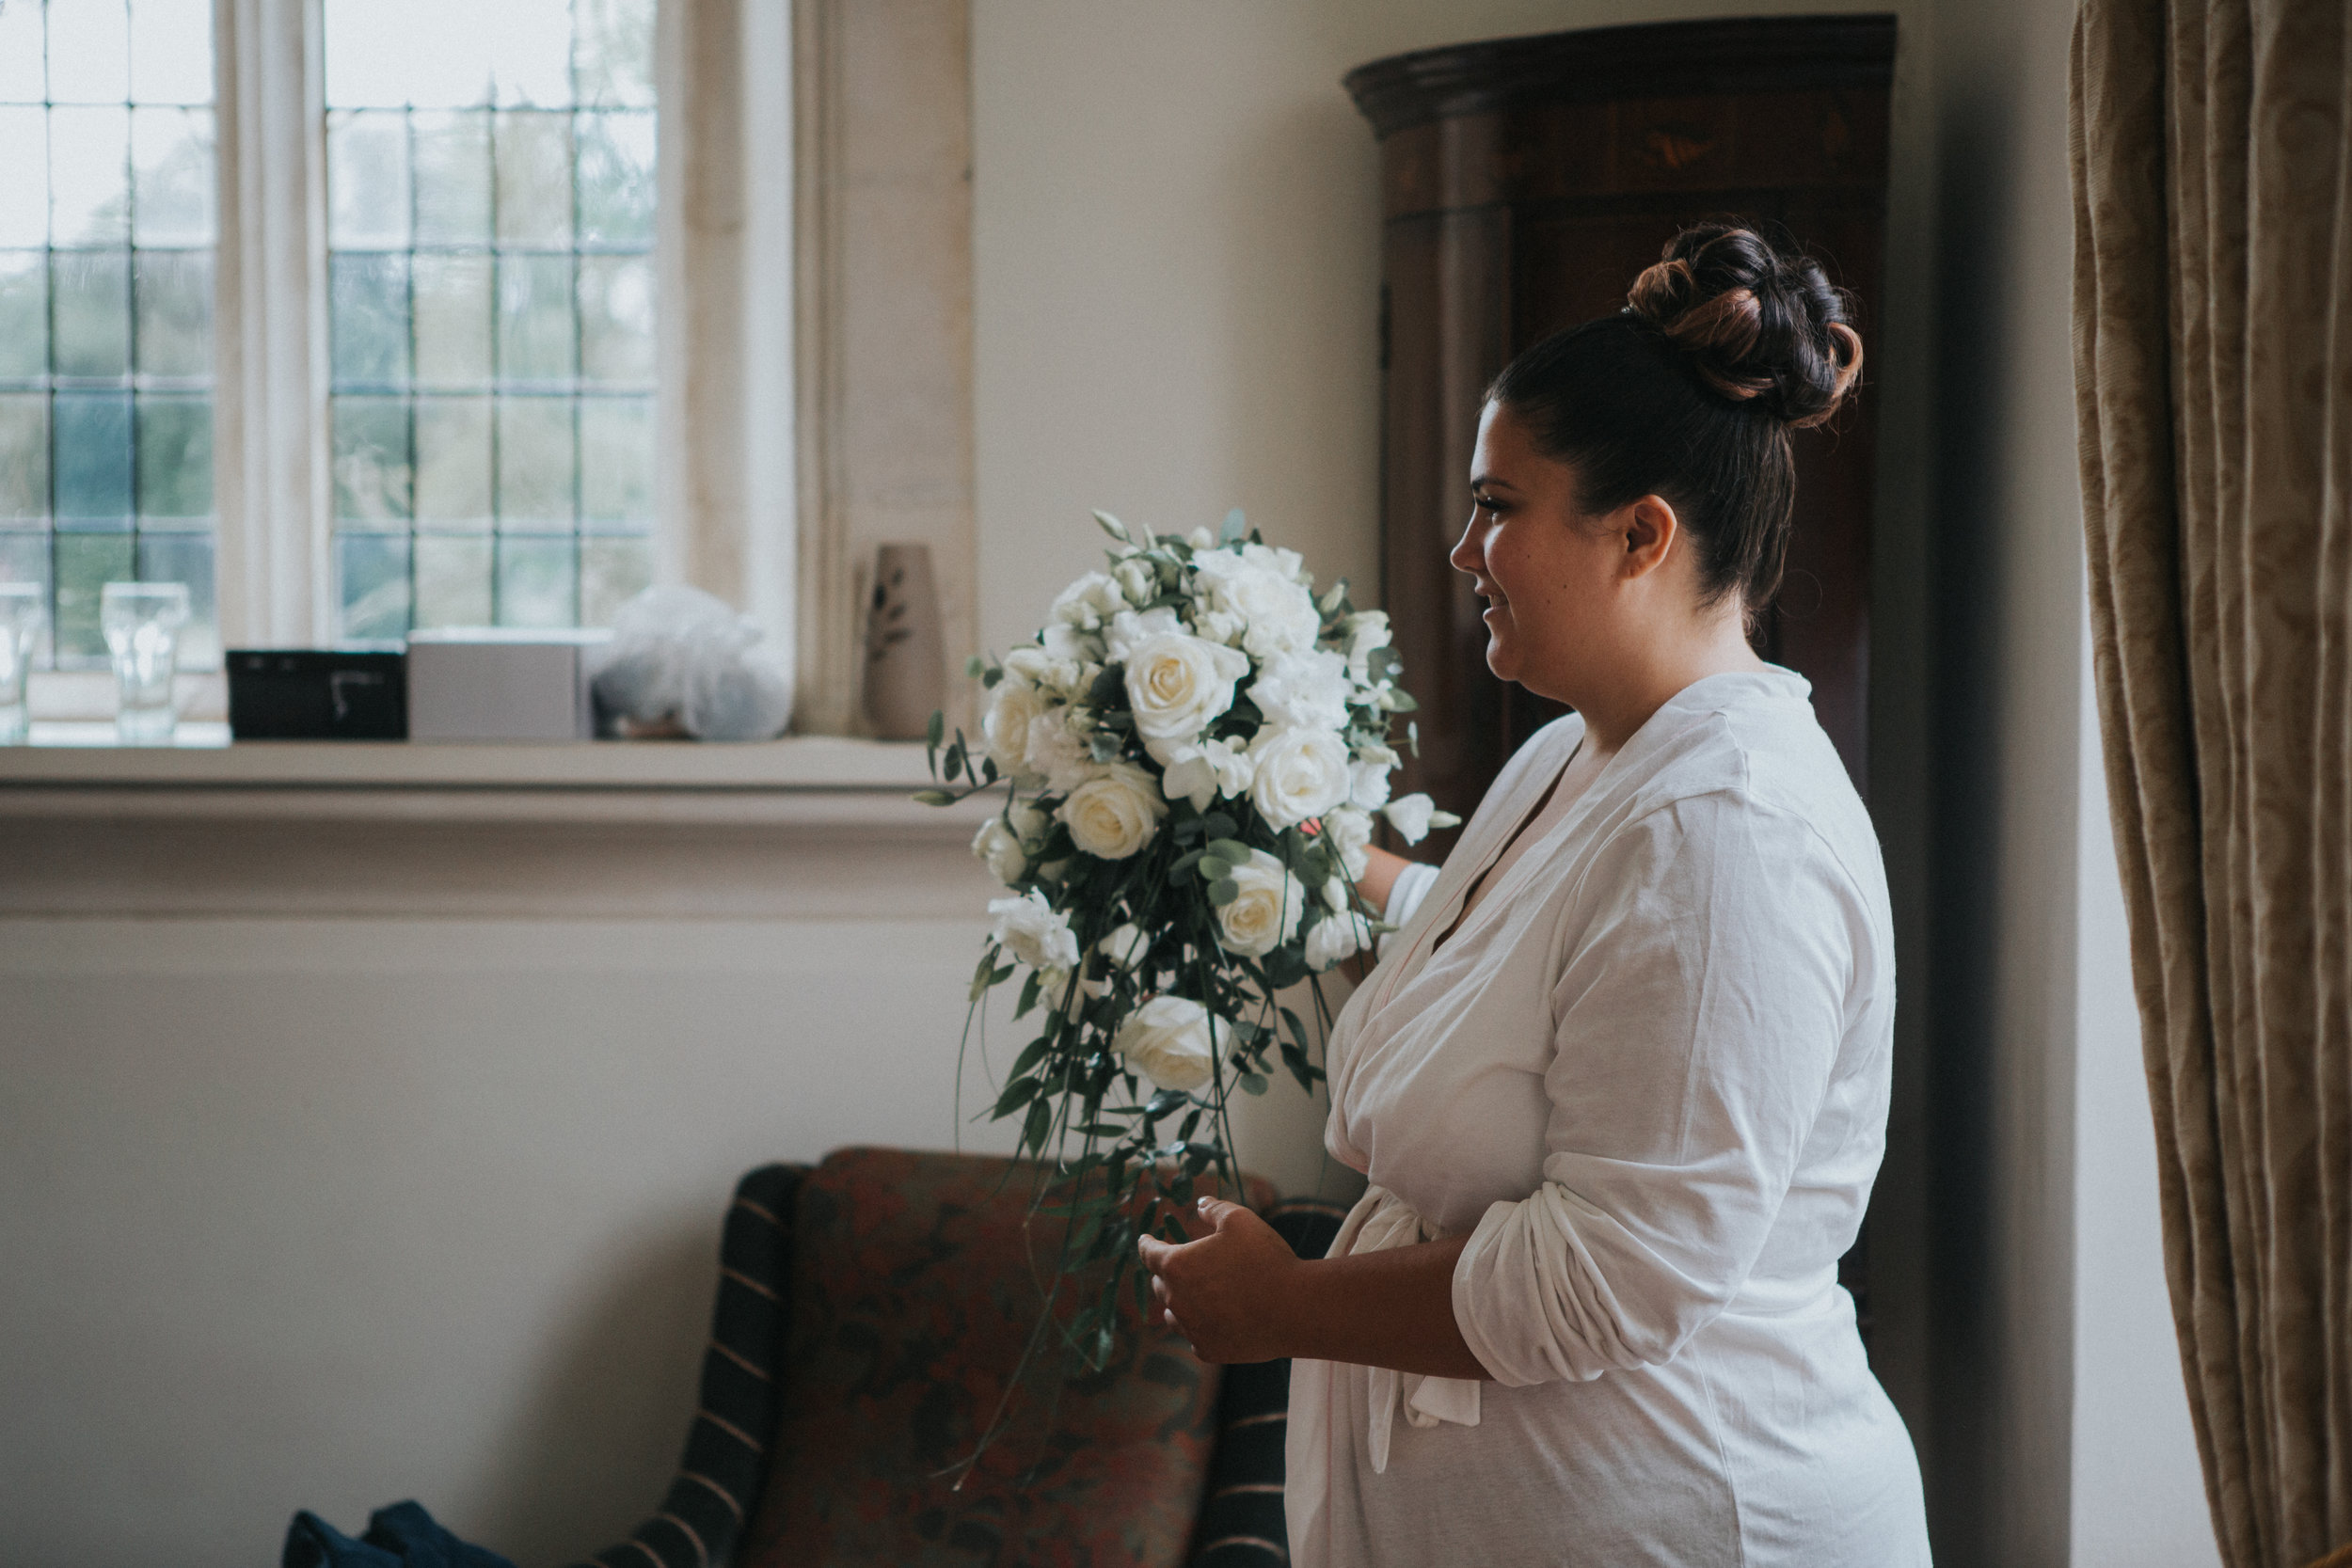 westenhangar-castle-kent-london-wedding-photography-bridal-portrait-03